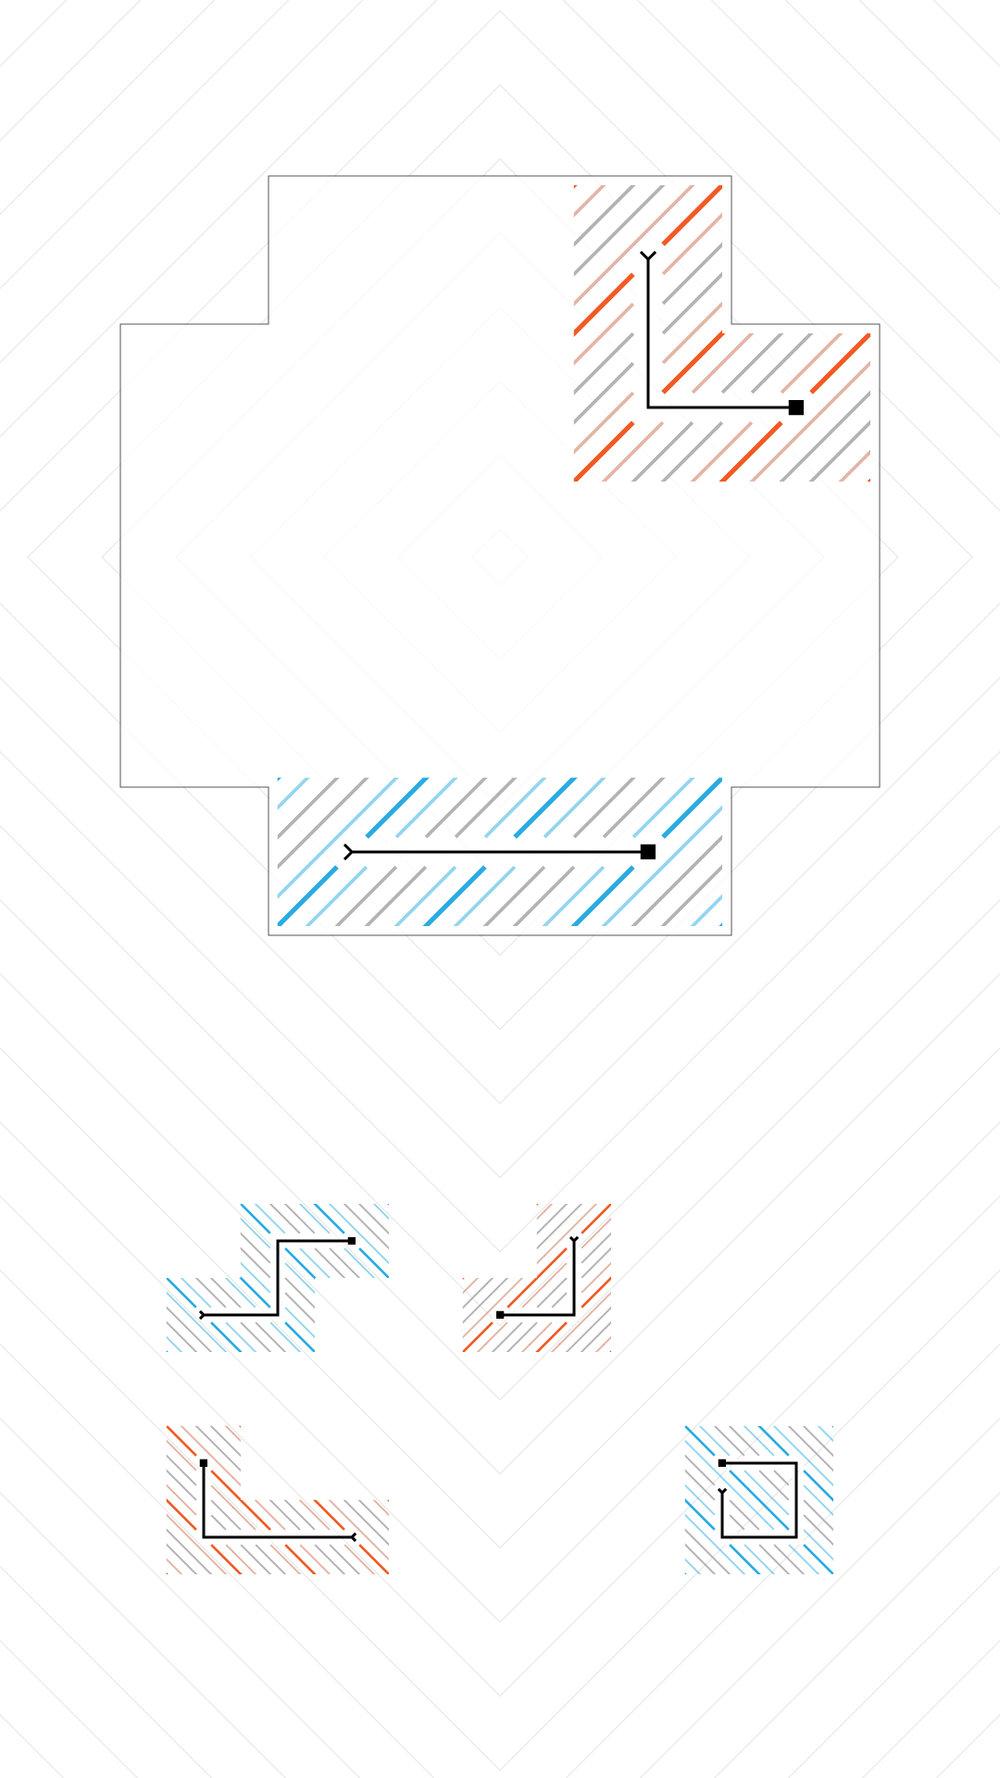 level-appearance-10.jpg